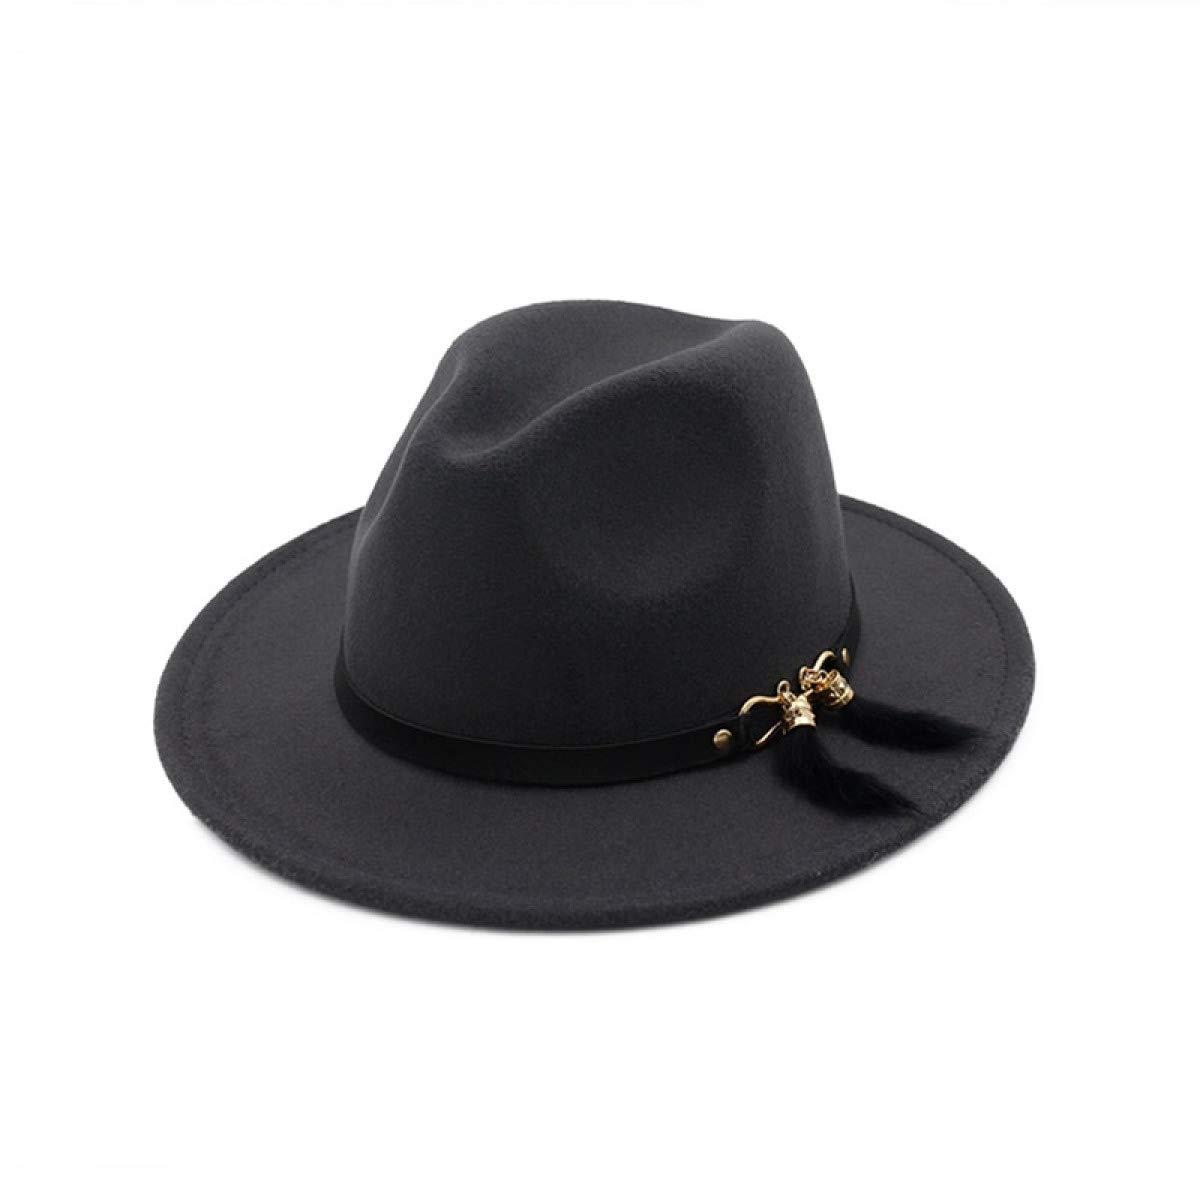 Fedora Hats for Women Autumn Imitation Woolen Women Men Ladies Fedoras Top  Jazz Hat Army Green at Amazon Women s Clothing store  37a543597a46